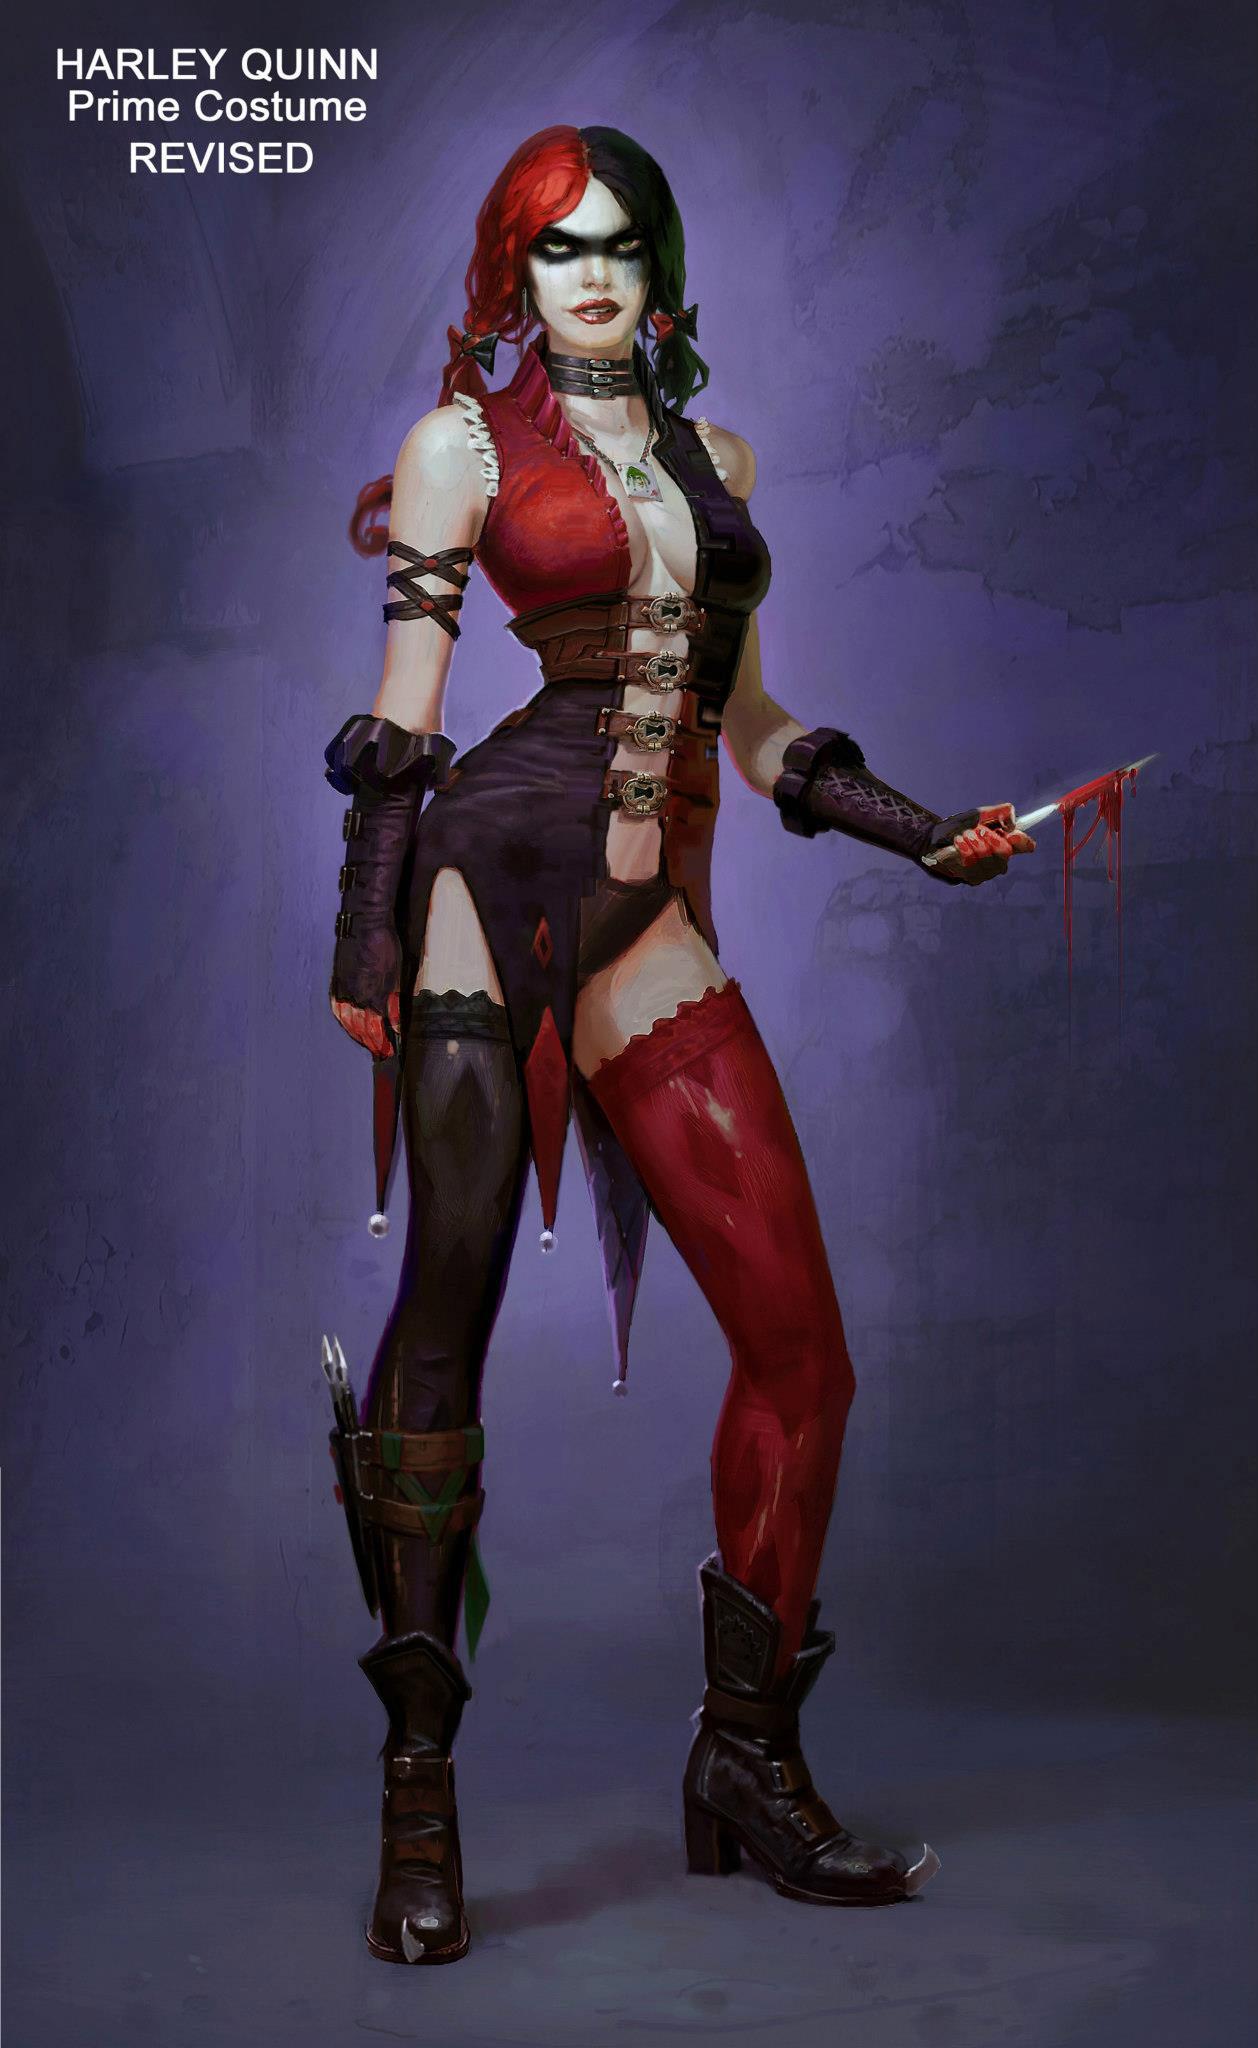 Harleyquinn Injustice Primecostume 244091 Bytes